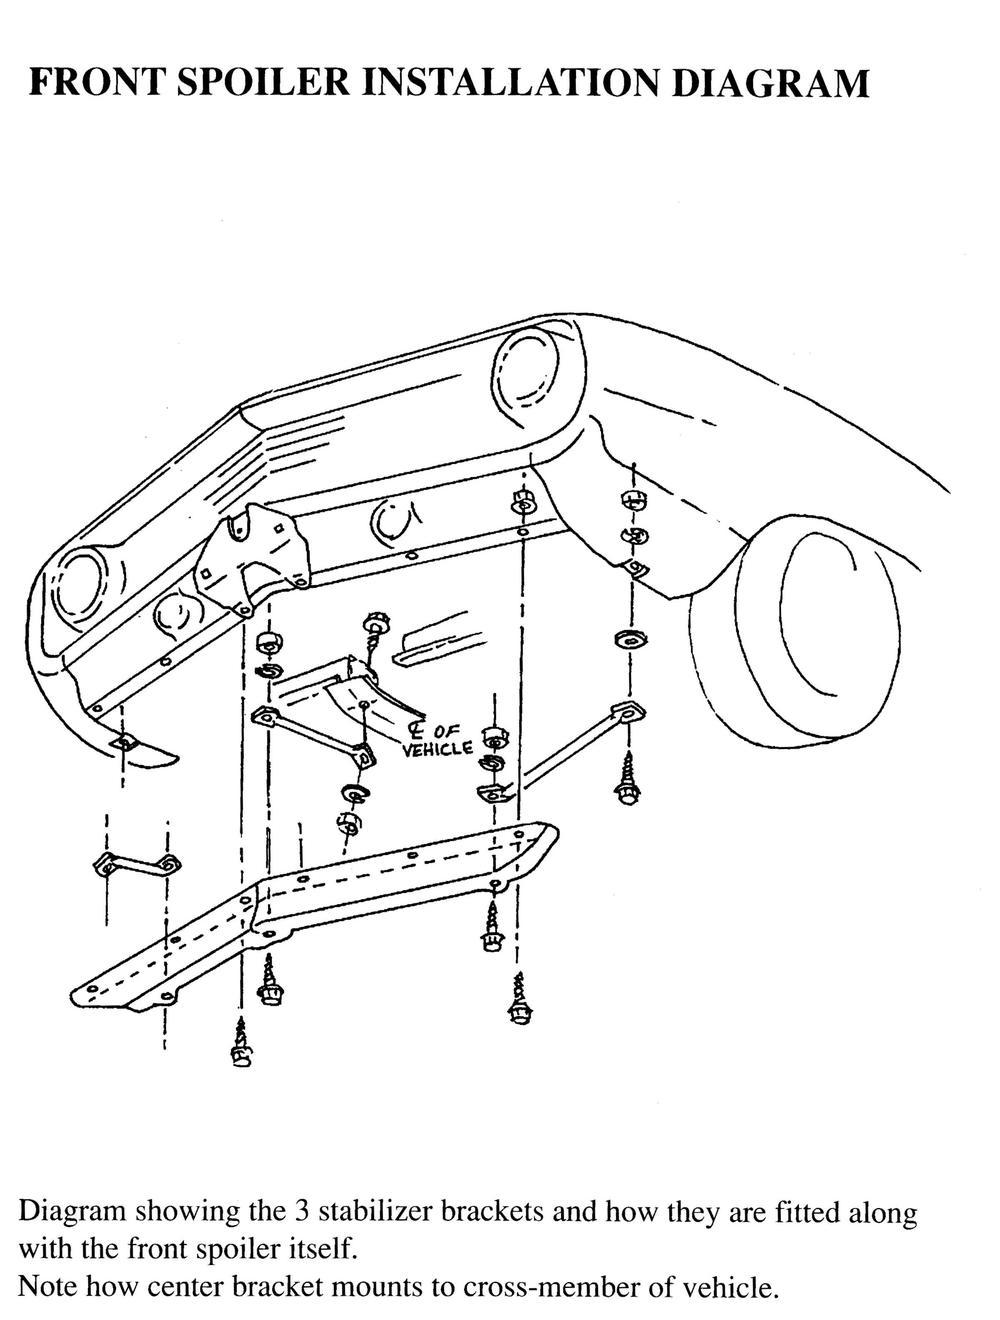 technical blog for camaro part installation steve s camaros rh stevescamaroparts com